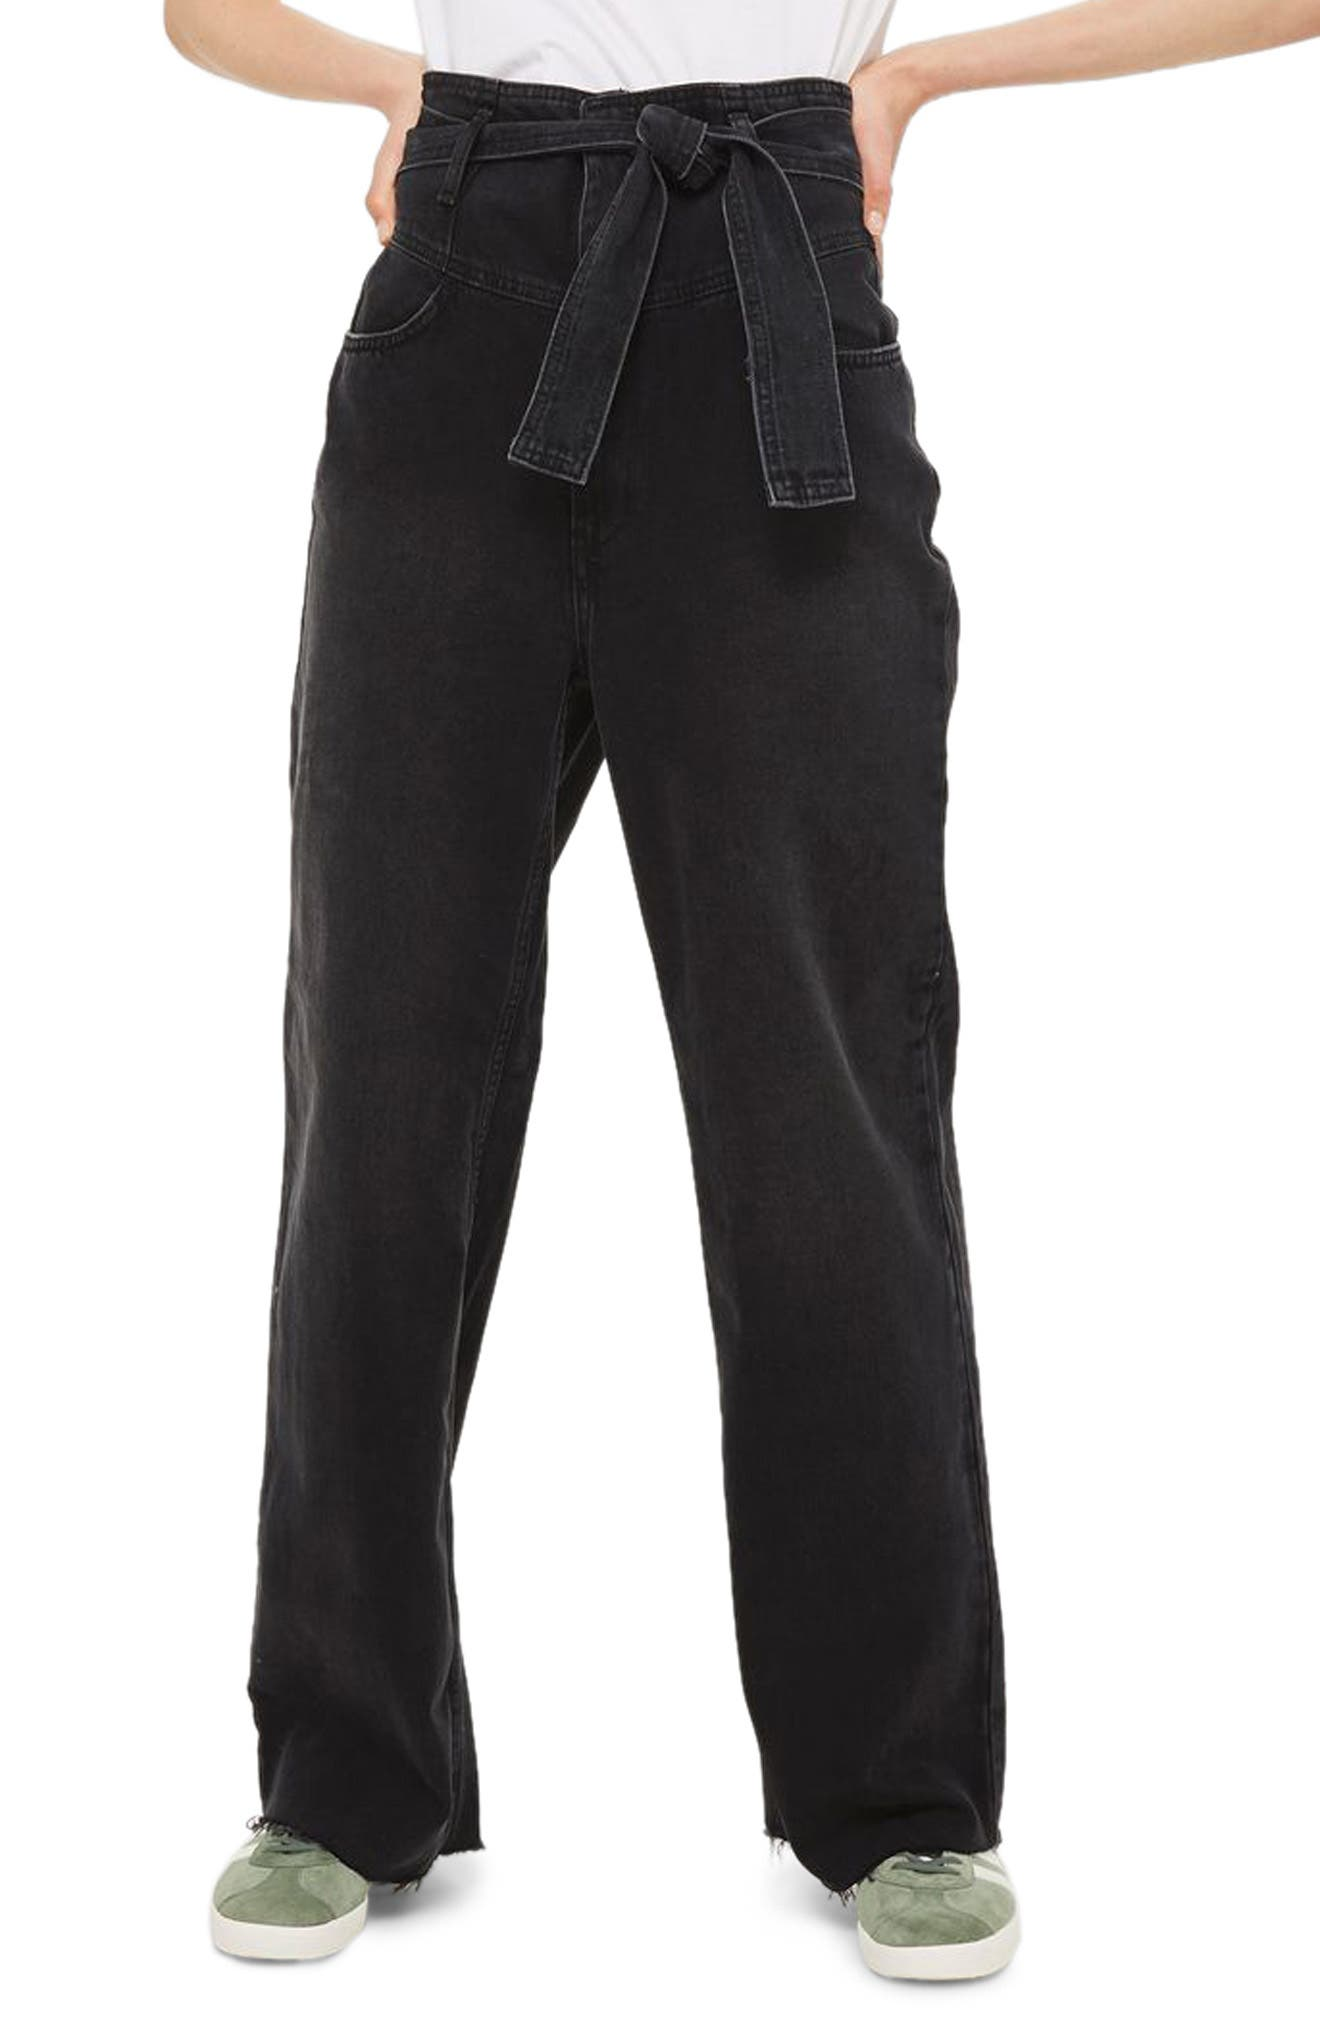 Topshop Belted Wide Leg Jeans